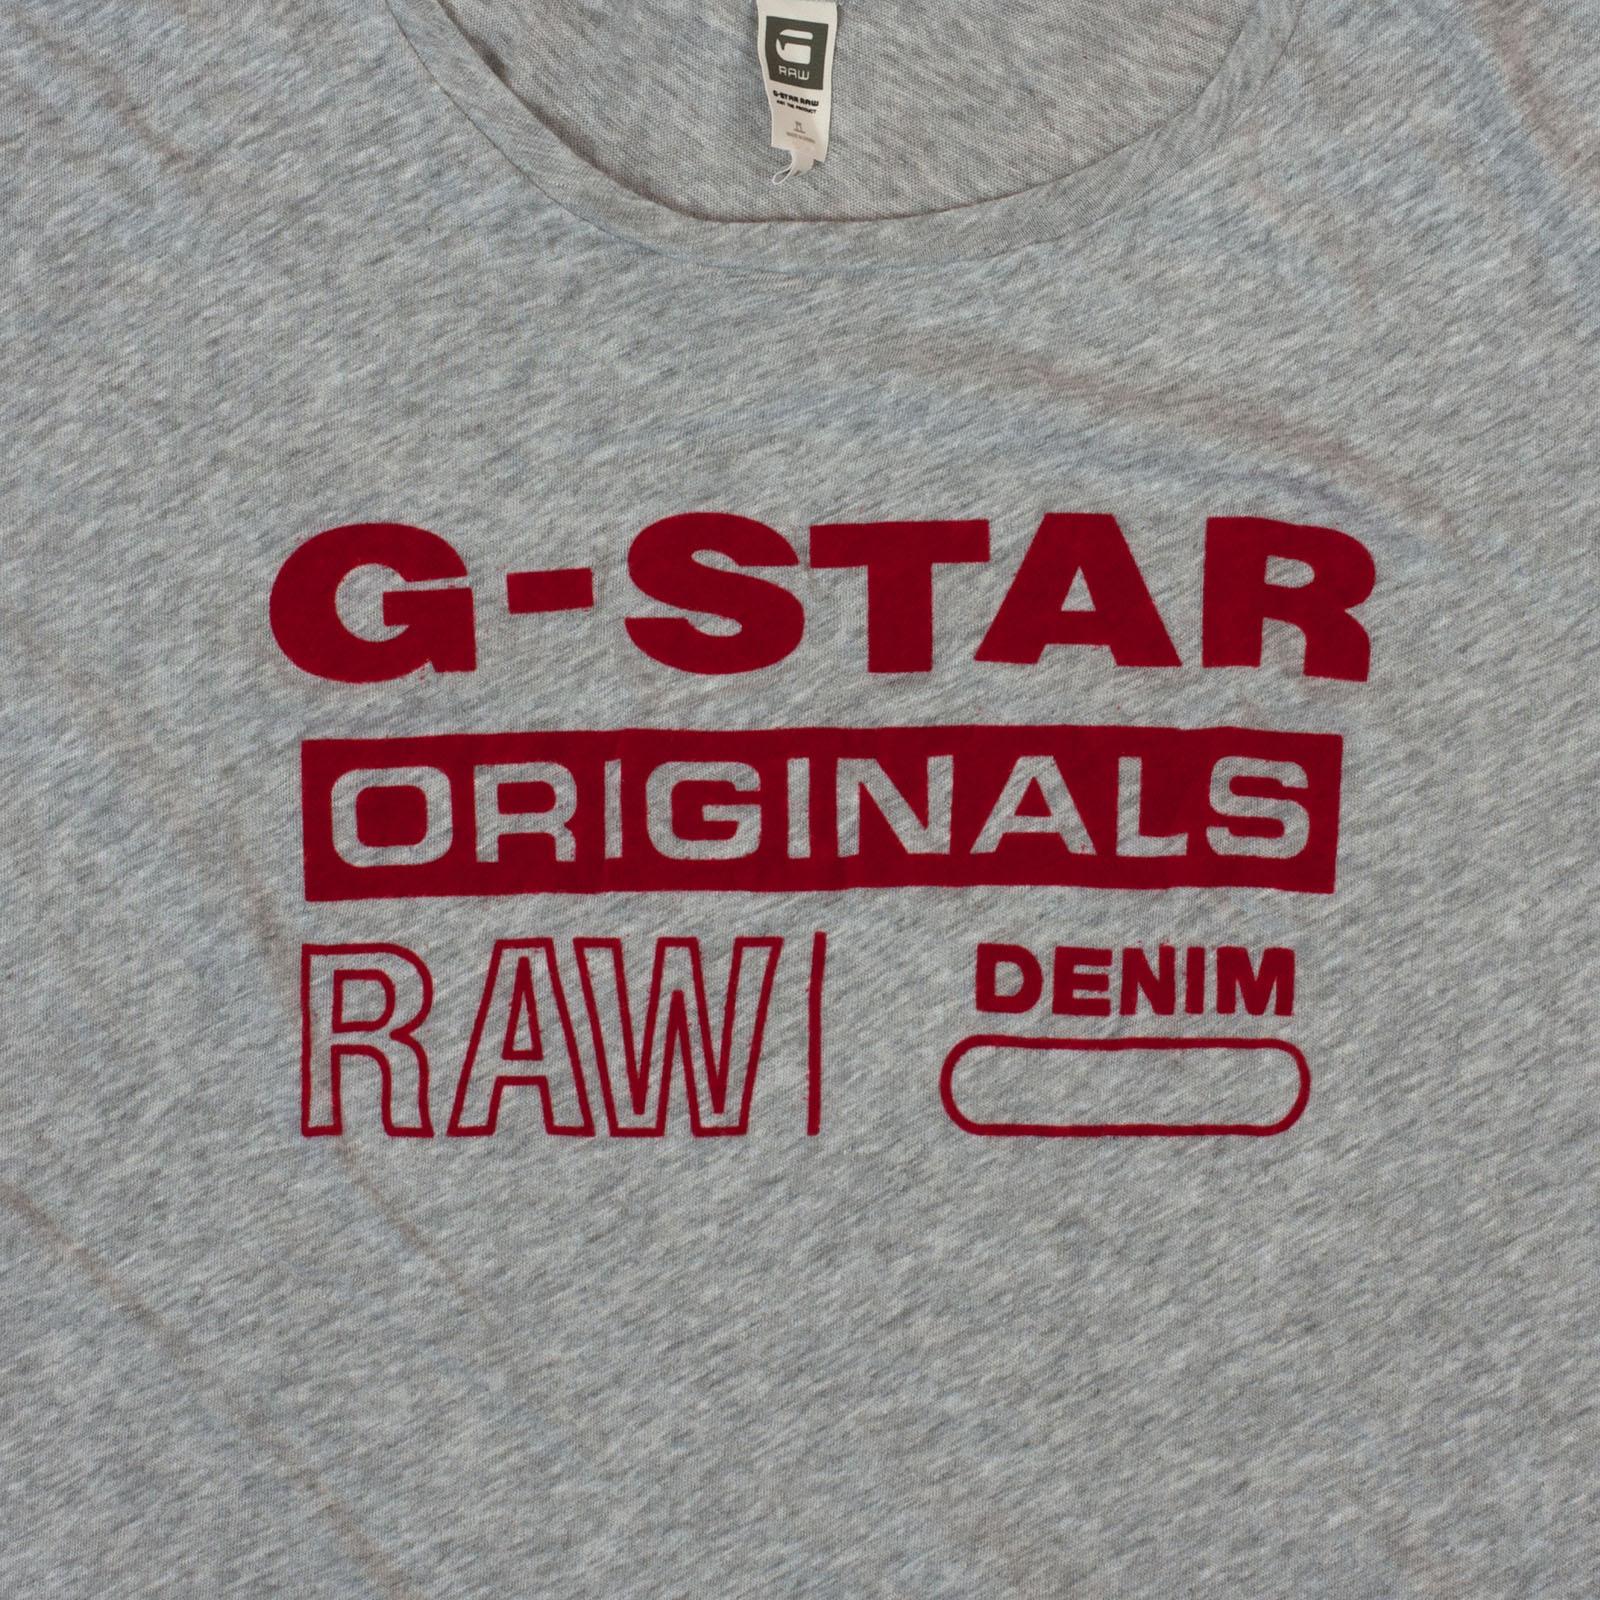 Футболка для стиля деним от G-Star Raw®